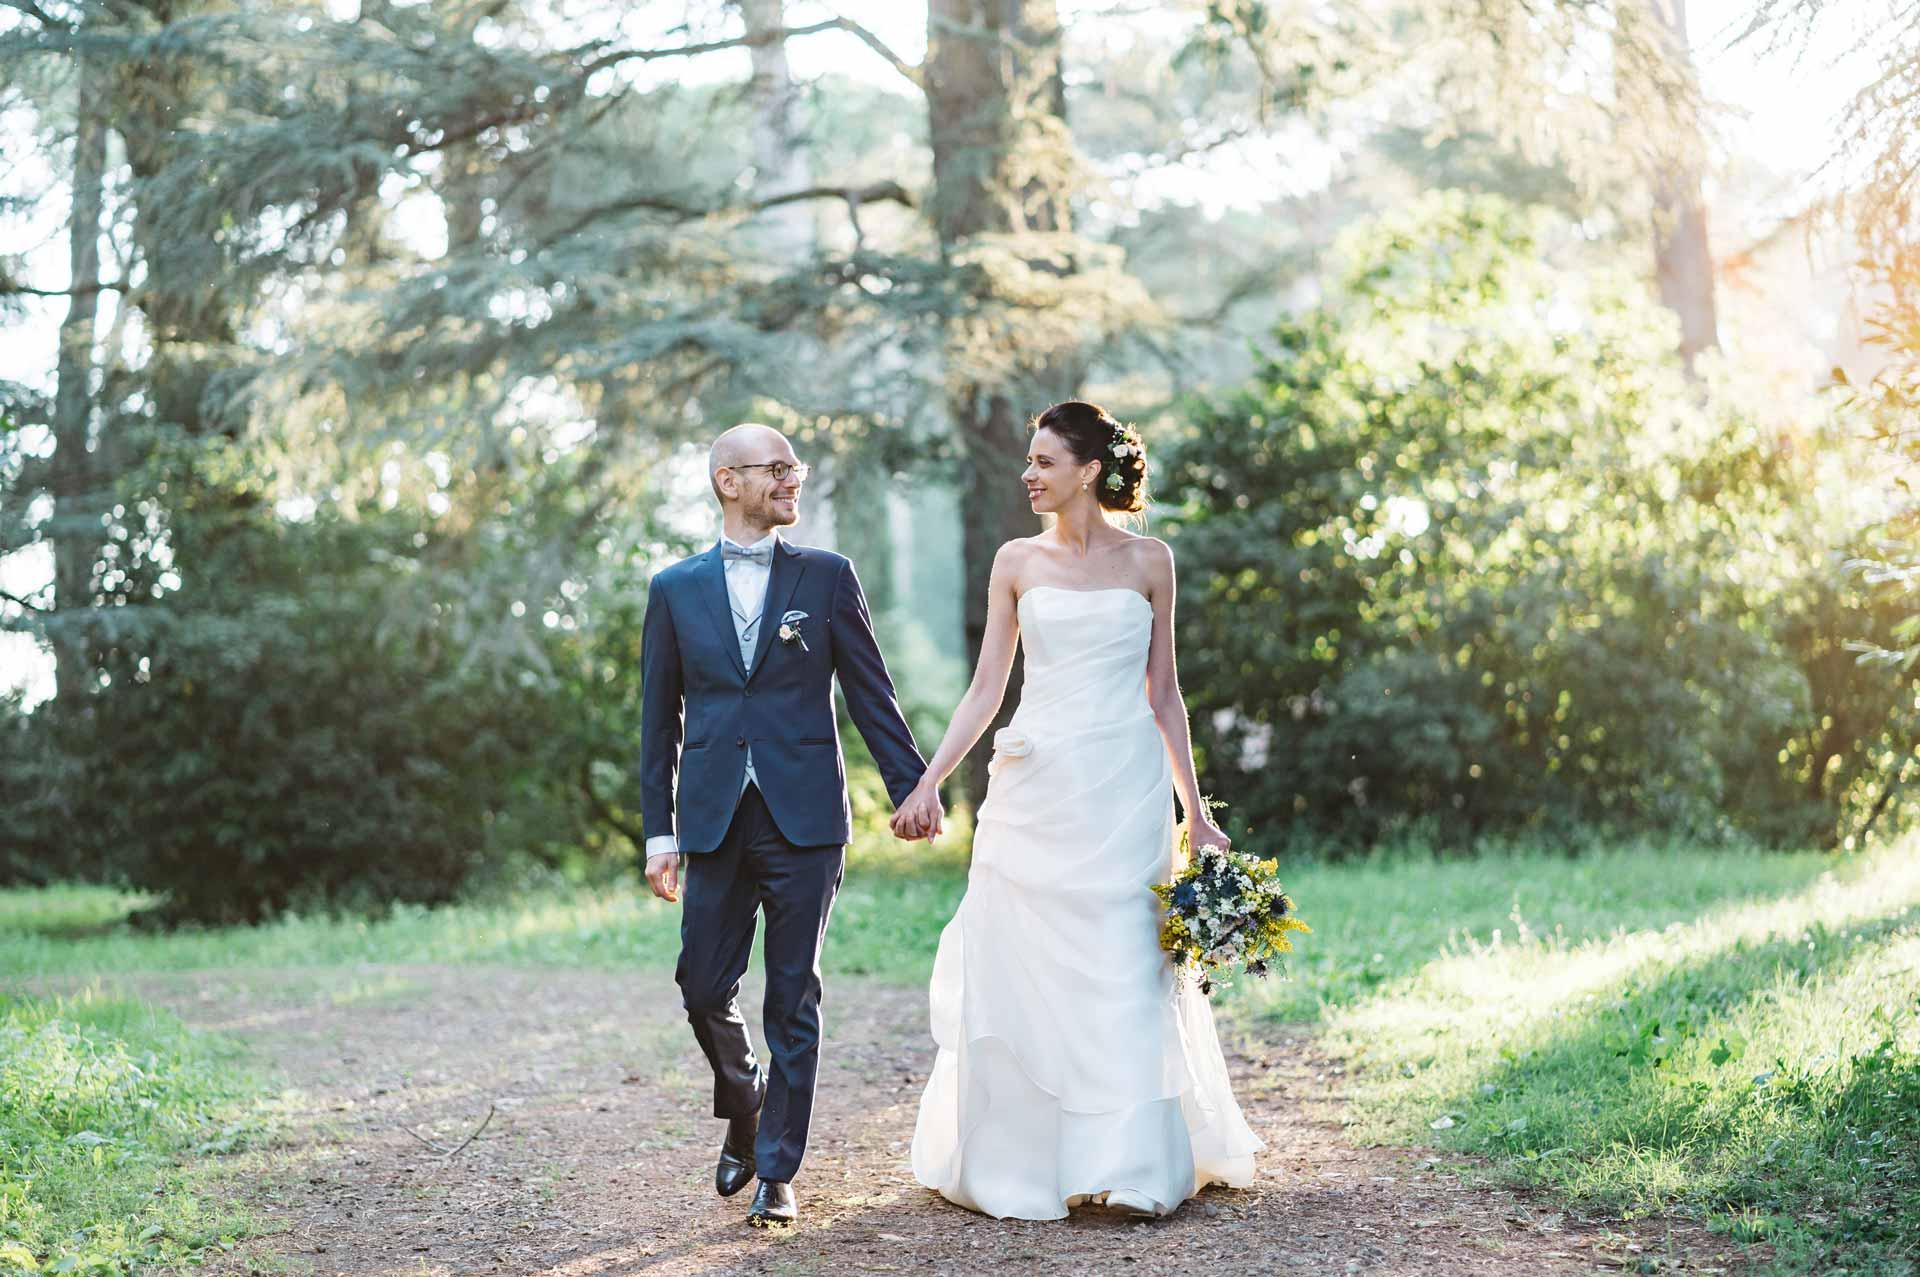 Fotografo-Matrimonio-Roma-Slide-i-50